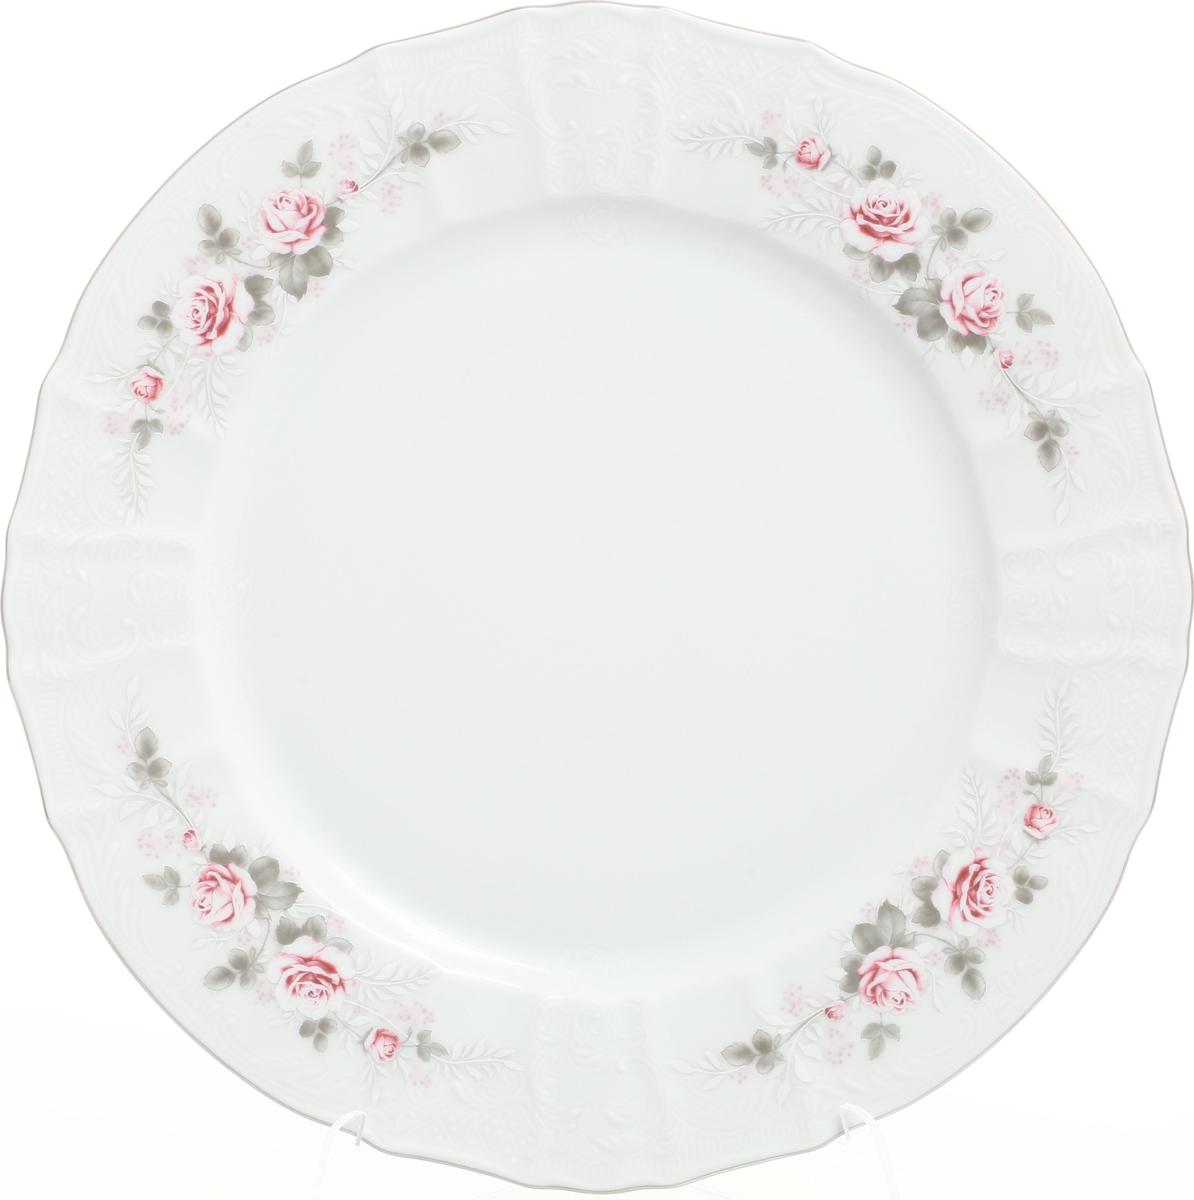 Блюдо Bernadotte Серая роза. Платина, круглое, диаметр 30 см цена